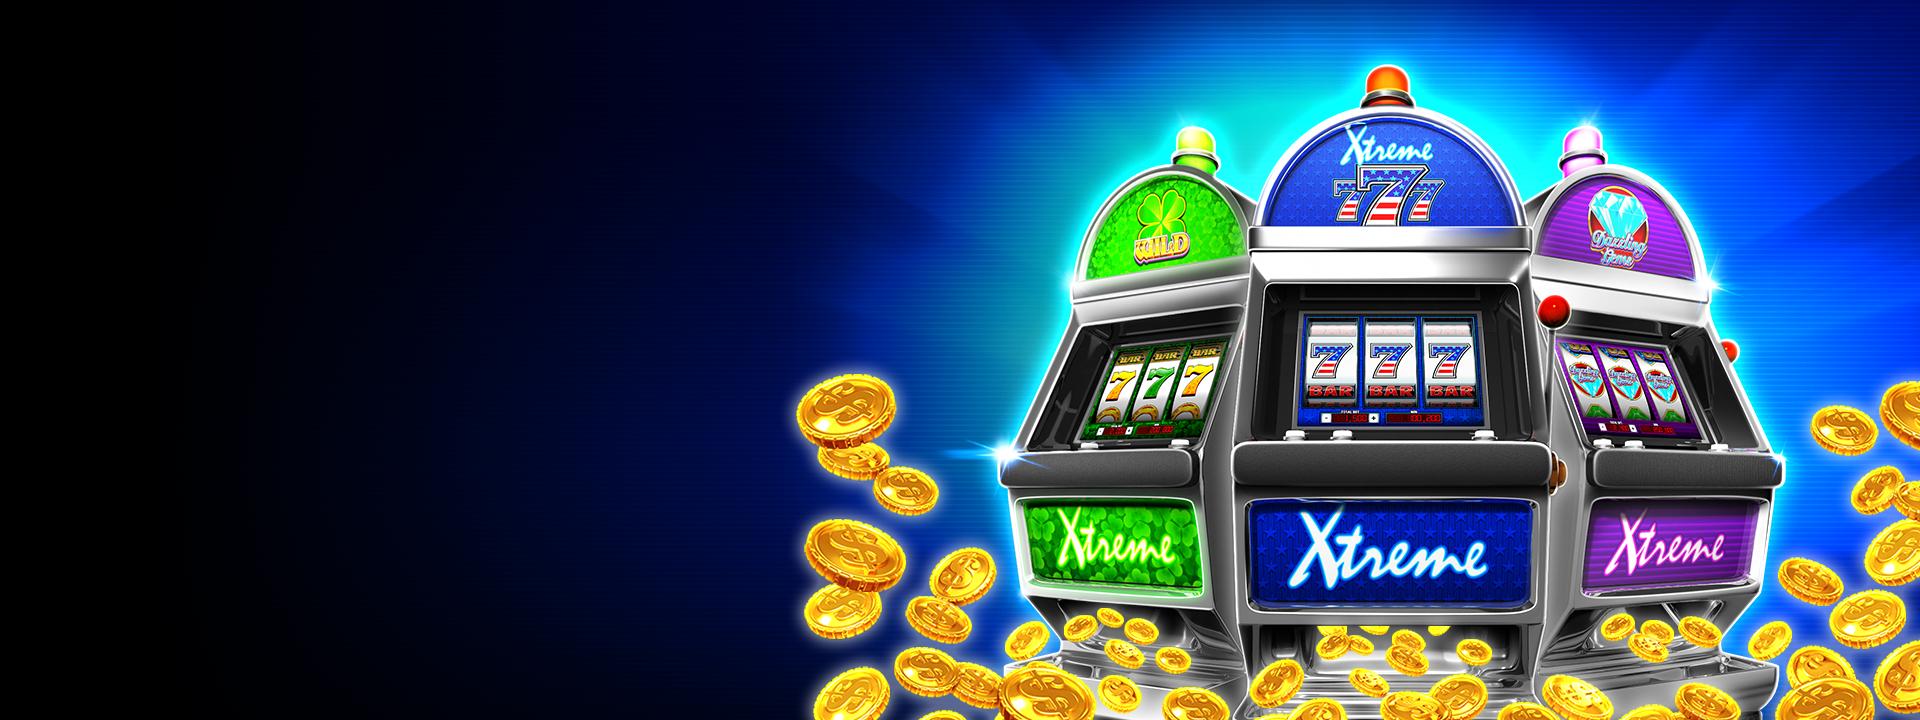 Slot machine earthbound